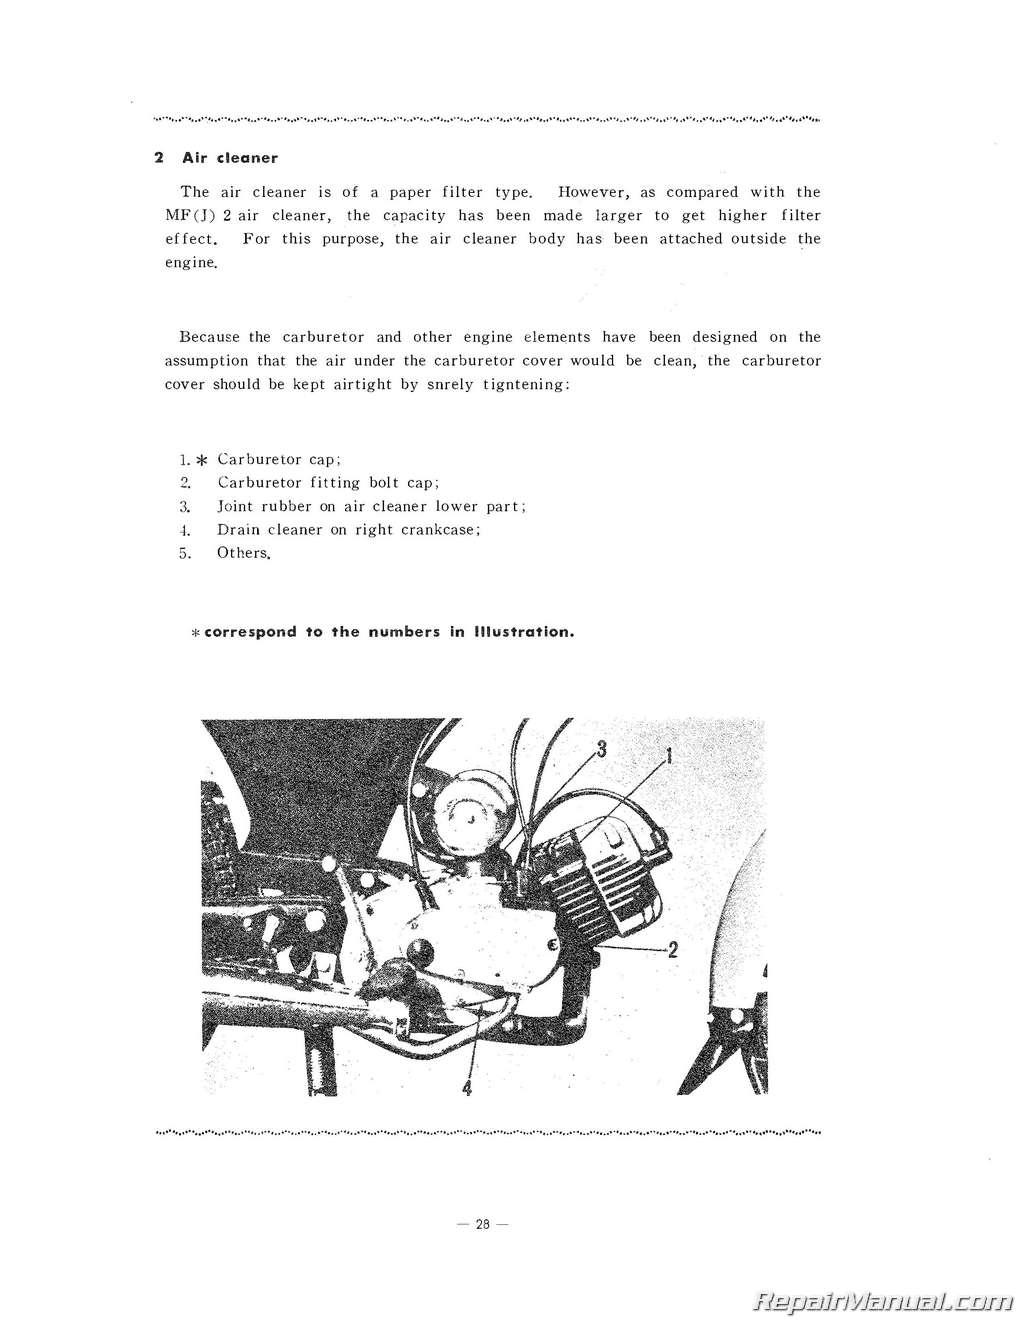 Honda Gx160 Pump Diagram likewise Honda Gx 340 Engine Diagram additionally Ford 5 4 Turbo Kit moreover Engine Parts TrailMaster 150 XRS XRX Buggy Gokart Head 3 moreover Kandi 250cc Go Kart Wiring Diagram. on trailmaster 150 wiring diagram